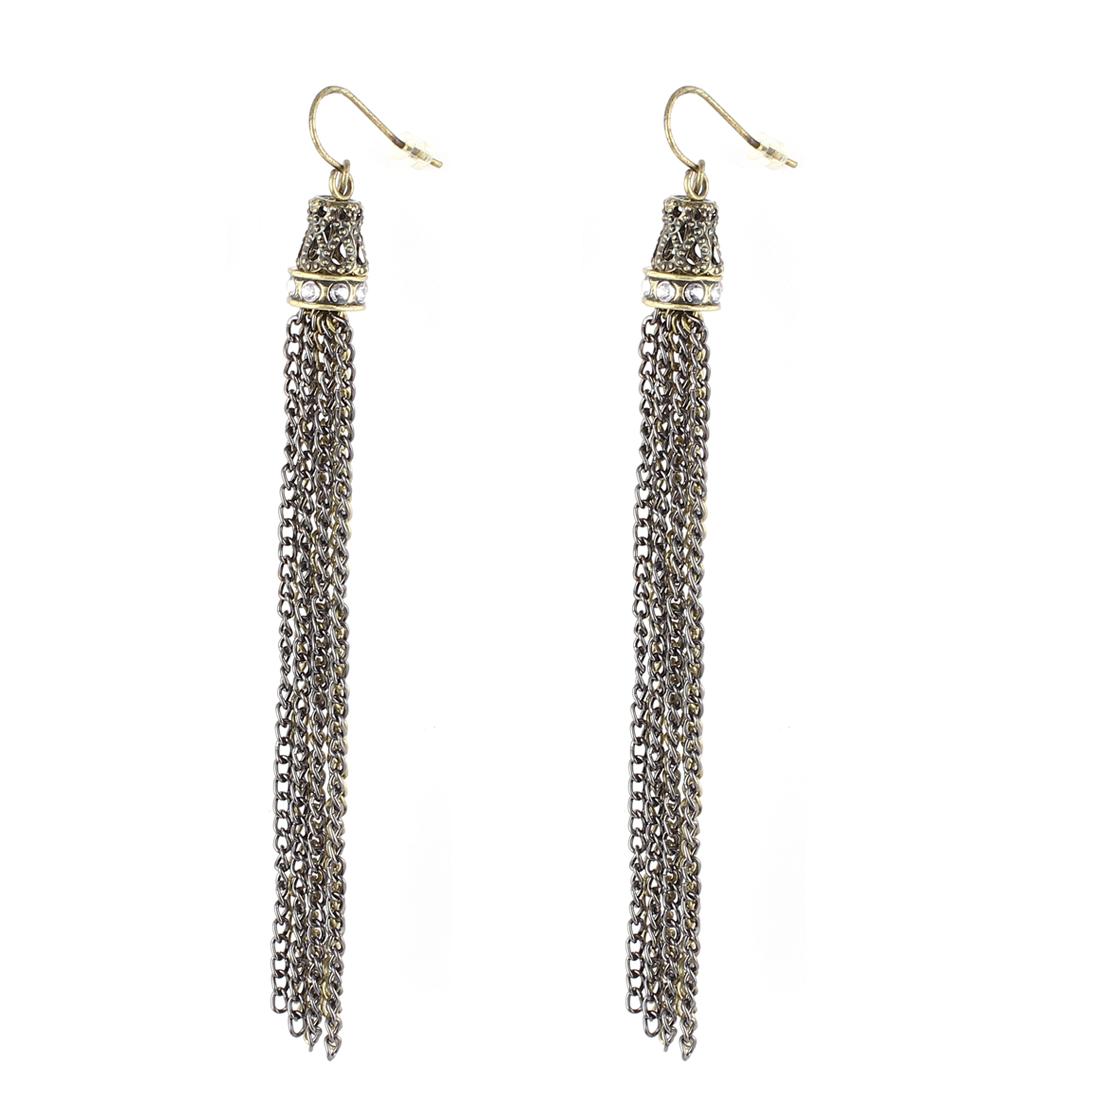 "Women Metal Chain Tassels Dangling Pendant Fish Hook Earrings Earbob Bronze Tone Black 4"" Length Pair"